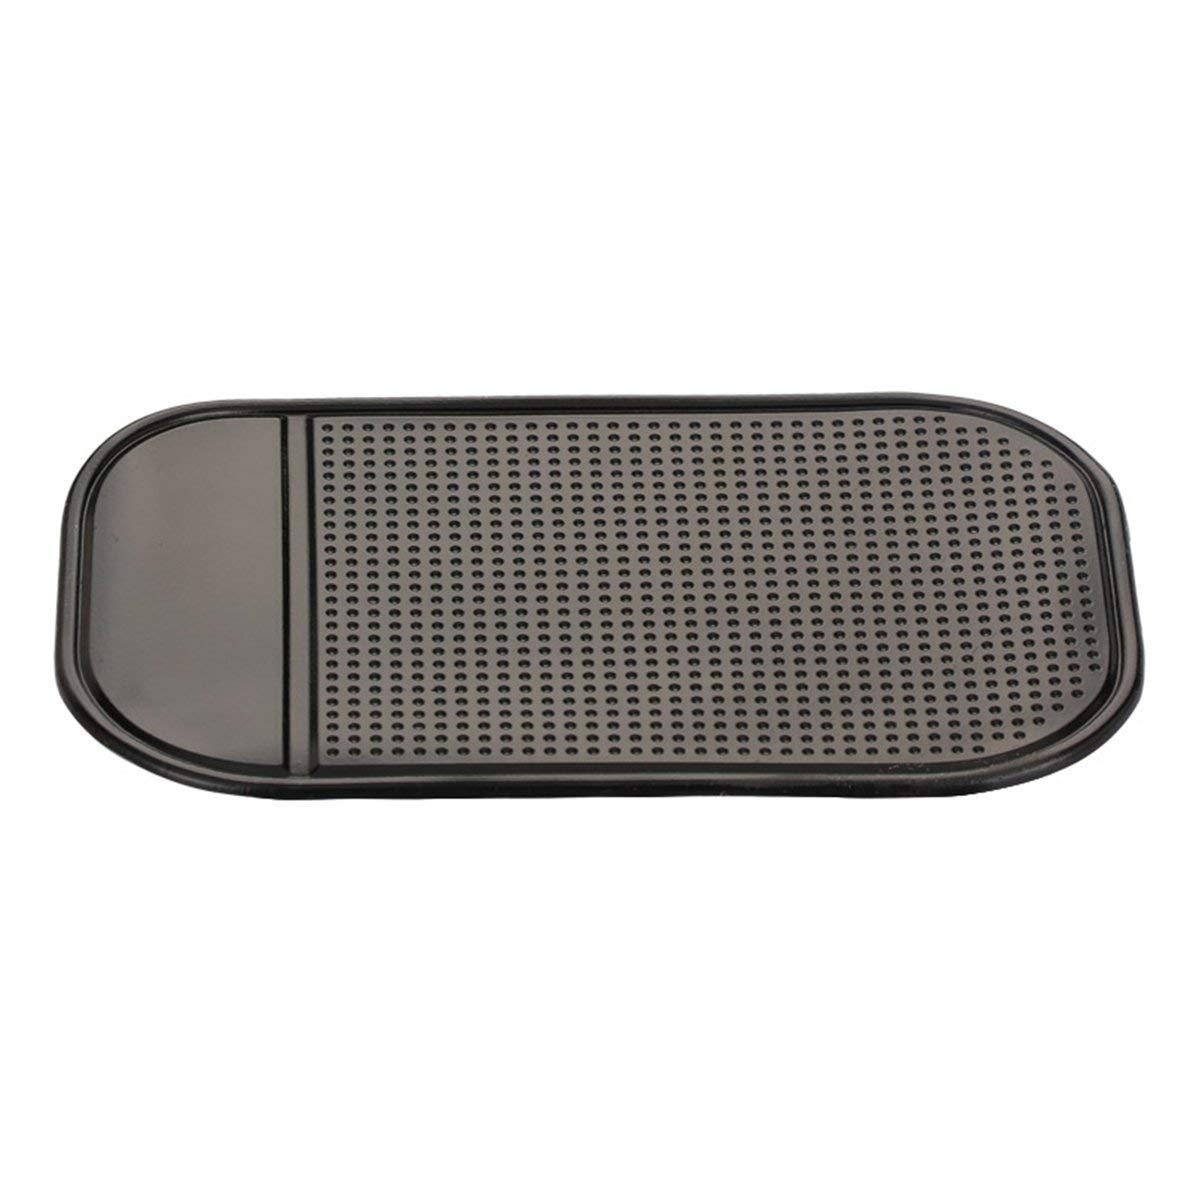 Car Dashboard Sticky Pad Car Gadget Silicone Mat Automobiles Interior Anti-Slip Mat Universal Vehicle Accessories